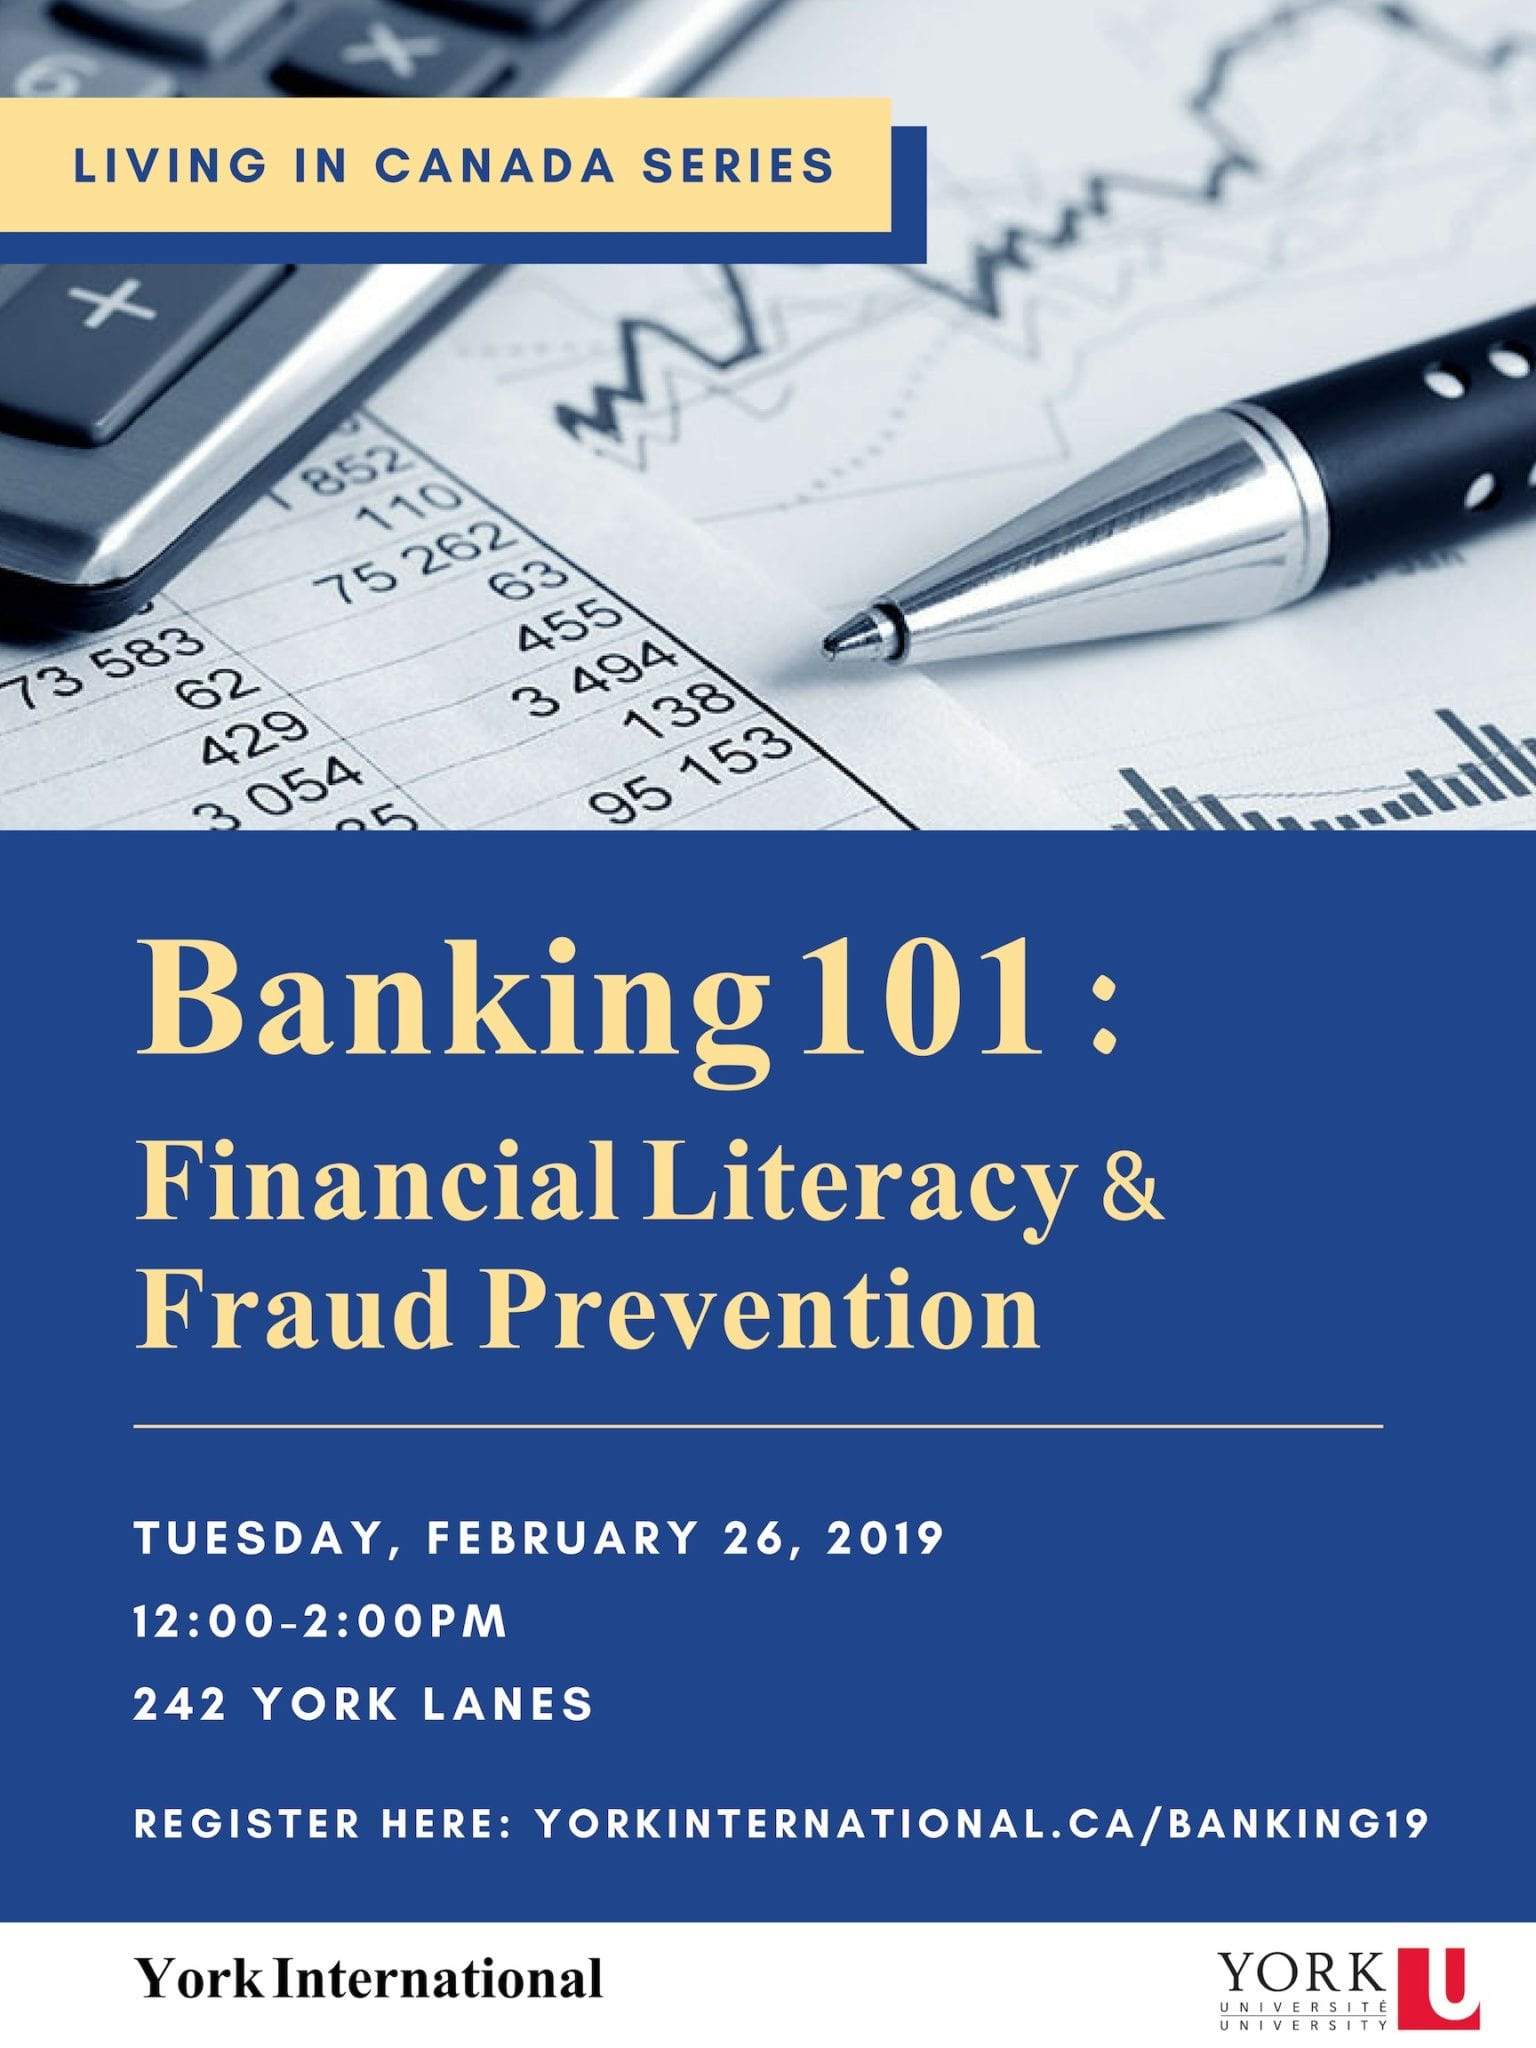 Banking 101: Fraud Prevention & Financial Literacy @ 242 York Lanes